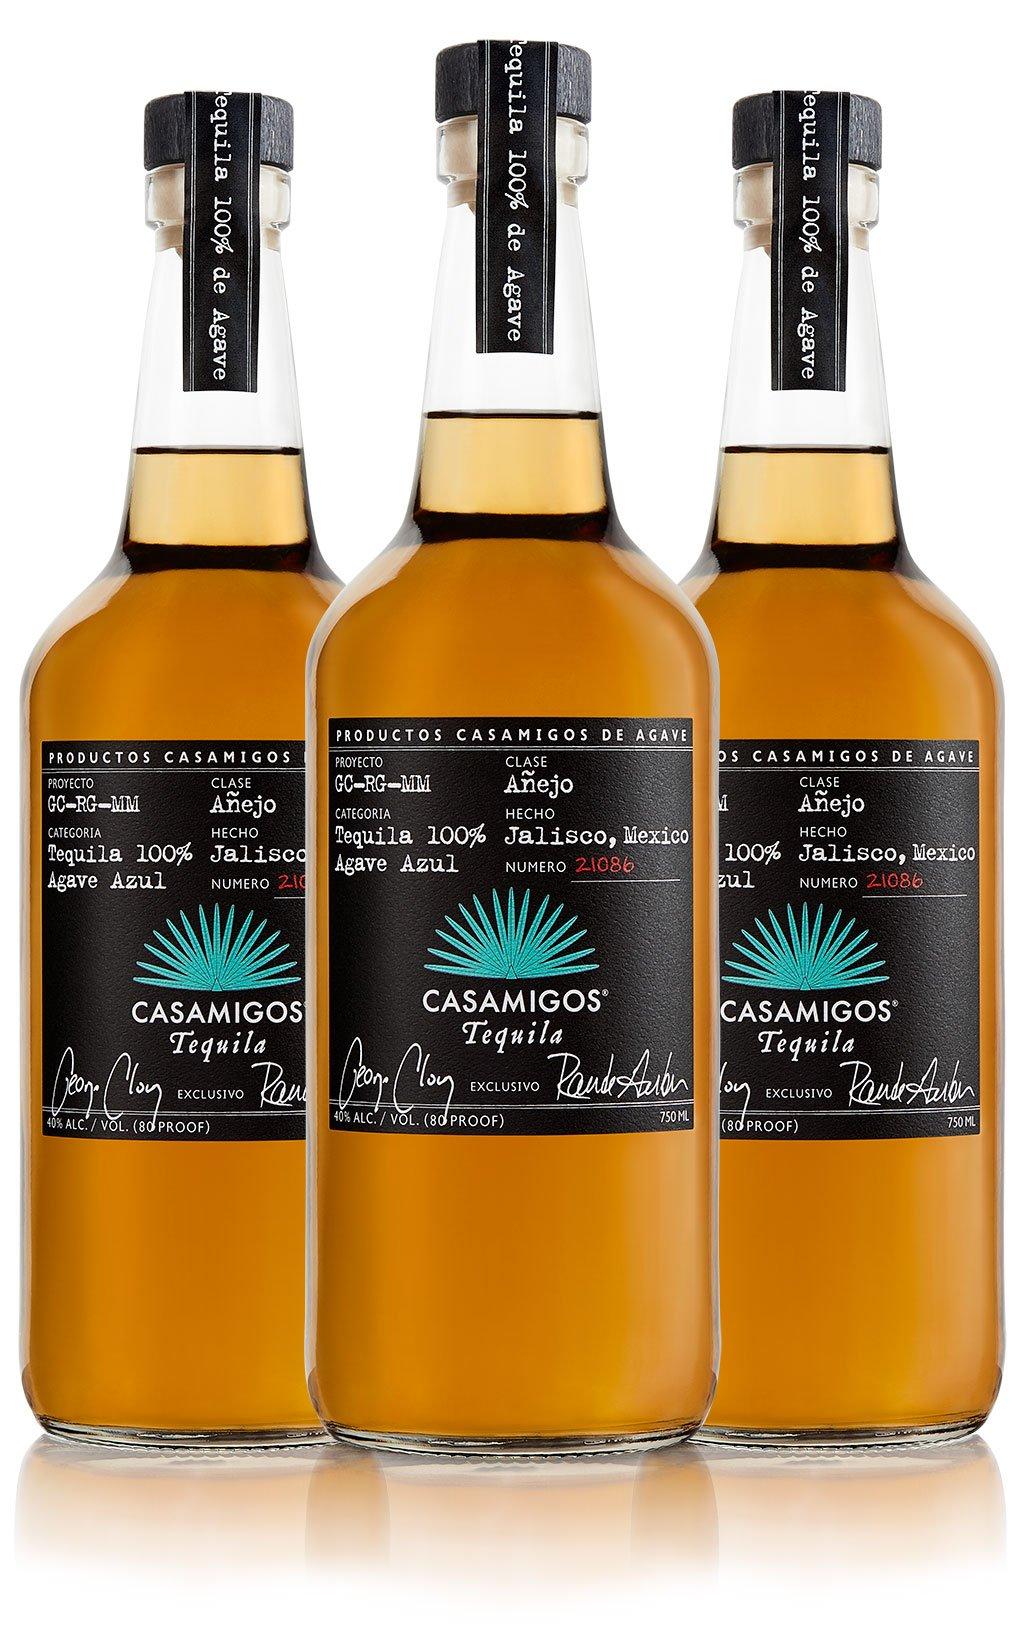 Casamigos Anejo Tequila 375ml